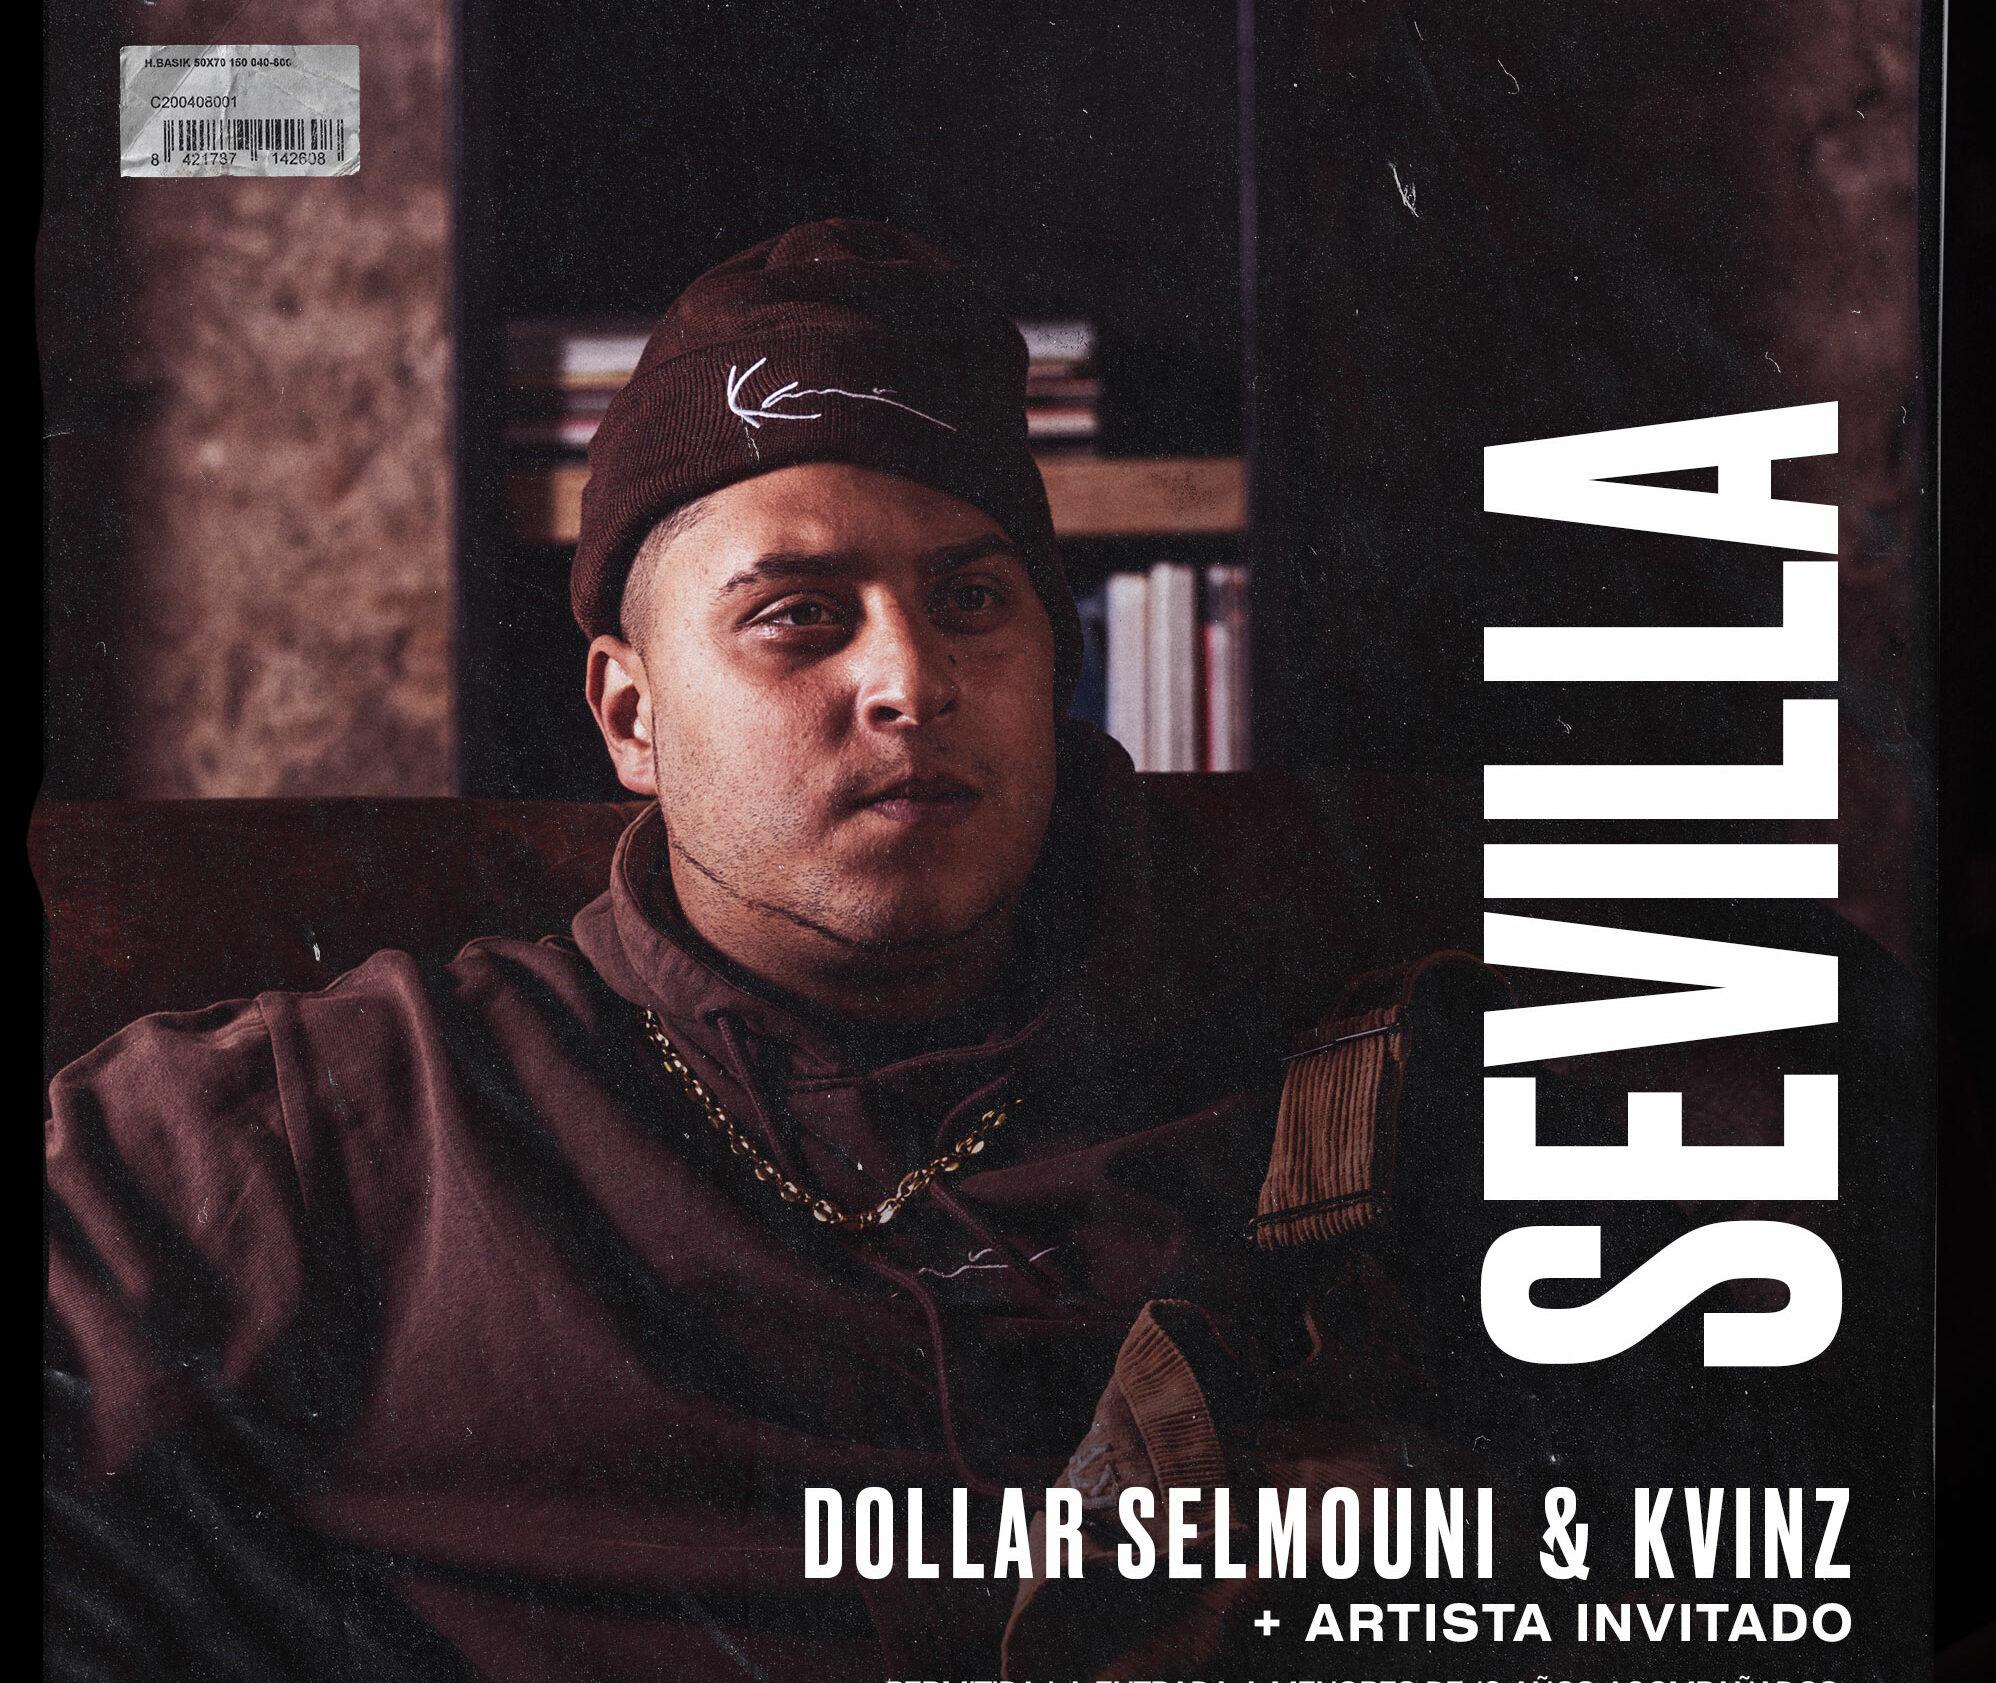 Dollar Selmouni